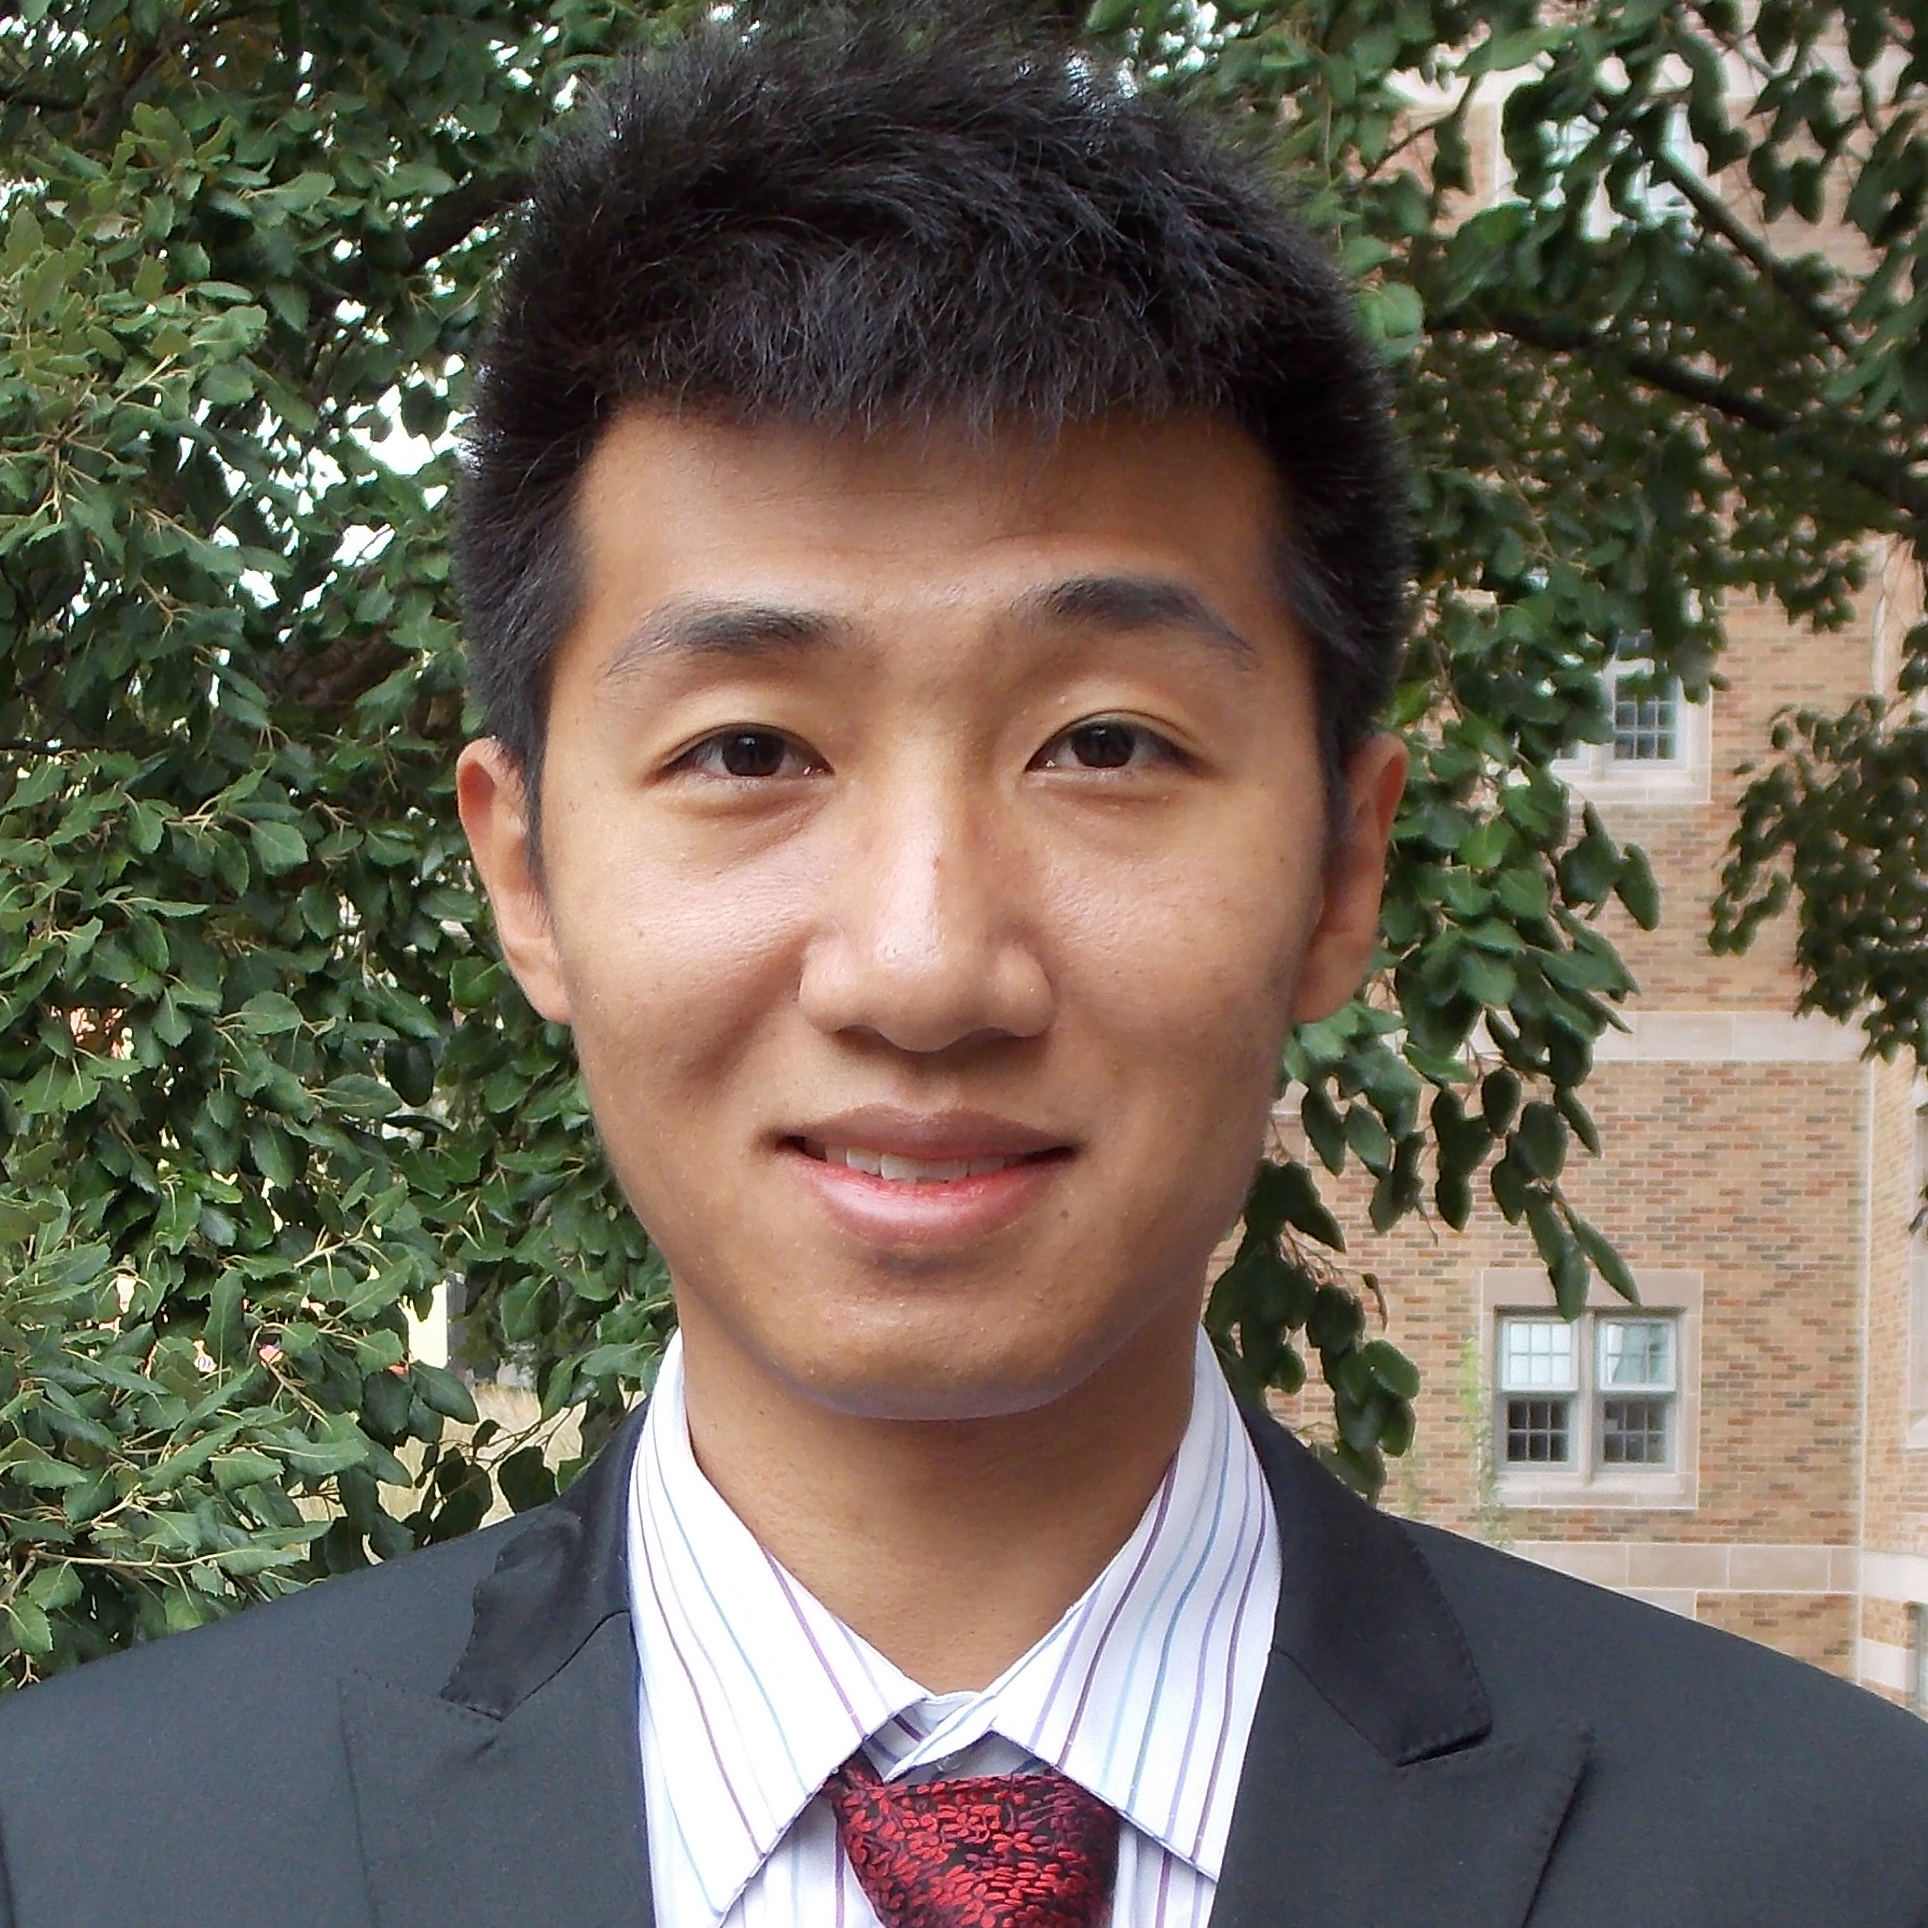 Zhenhuan Ren : Graduate Student